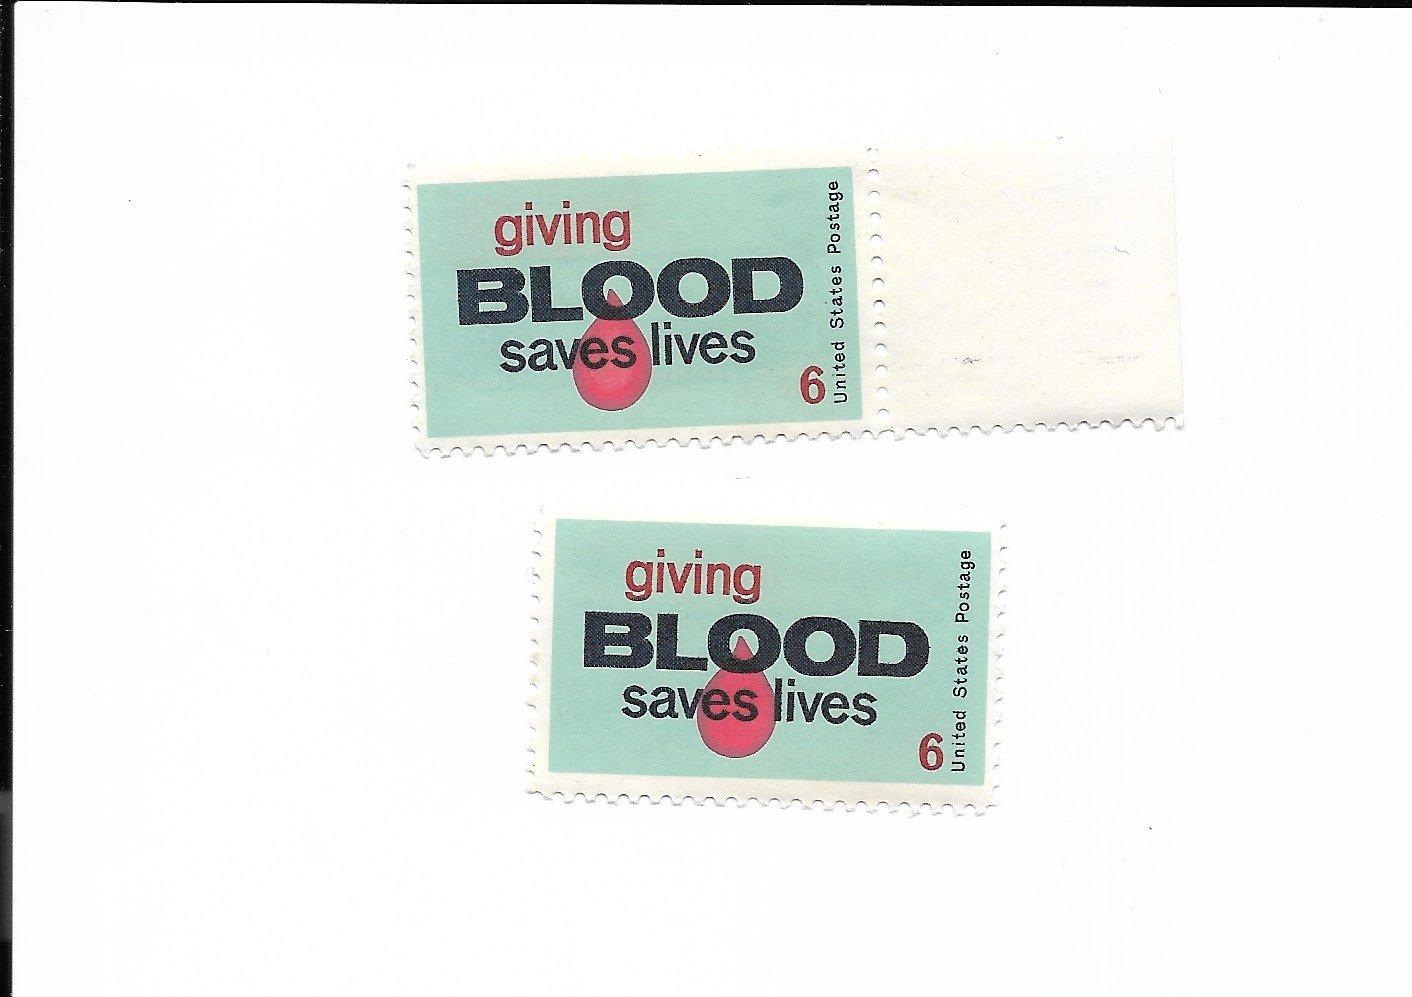 U.S. Stamps Scott #1425 6 cent GIVING BLOOD SAVES LIVES 1971